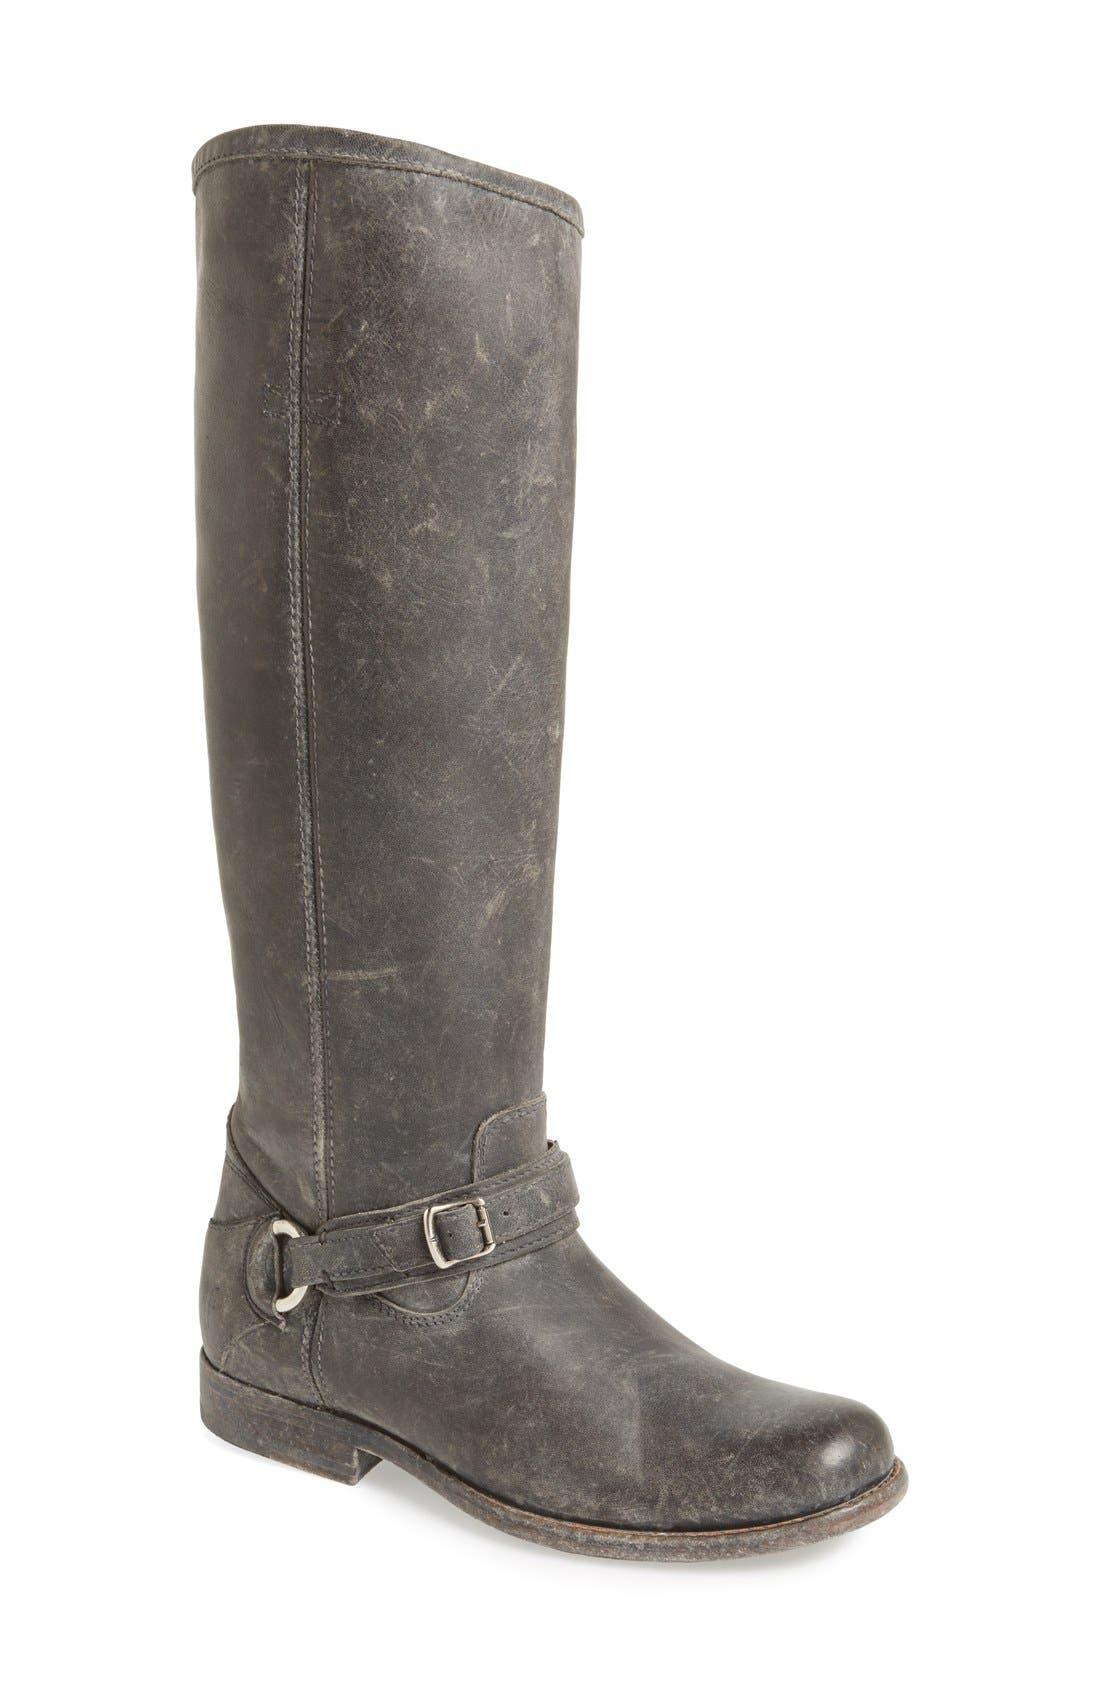 Main Image - Frye 'Phillip' Tall Boot (Women)